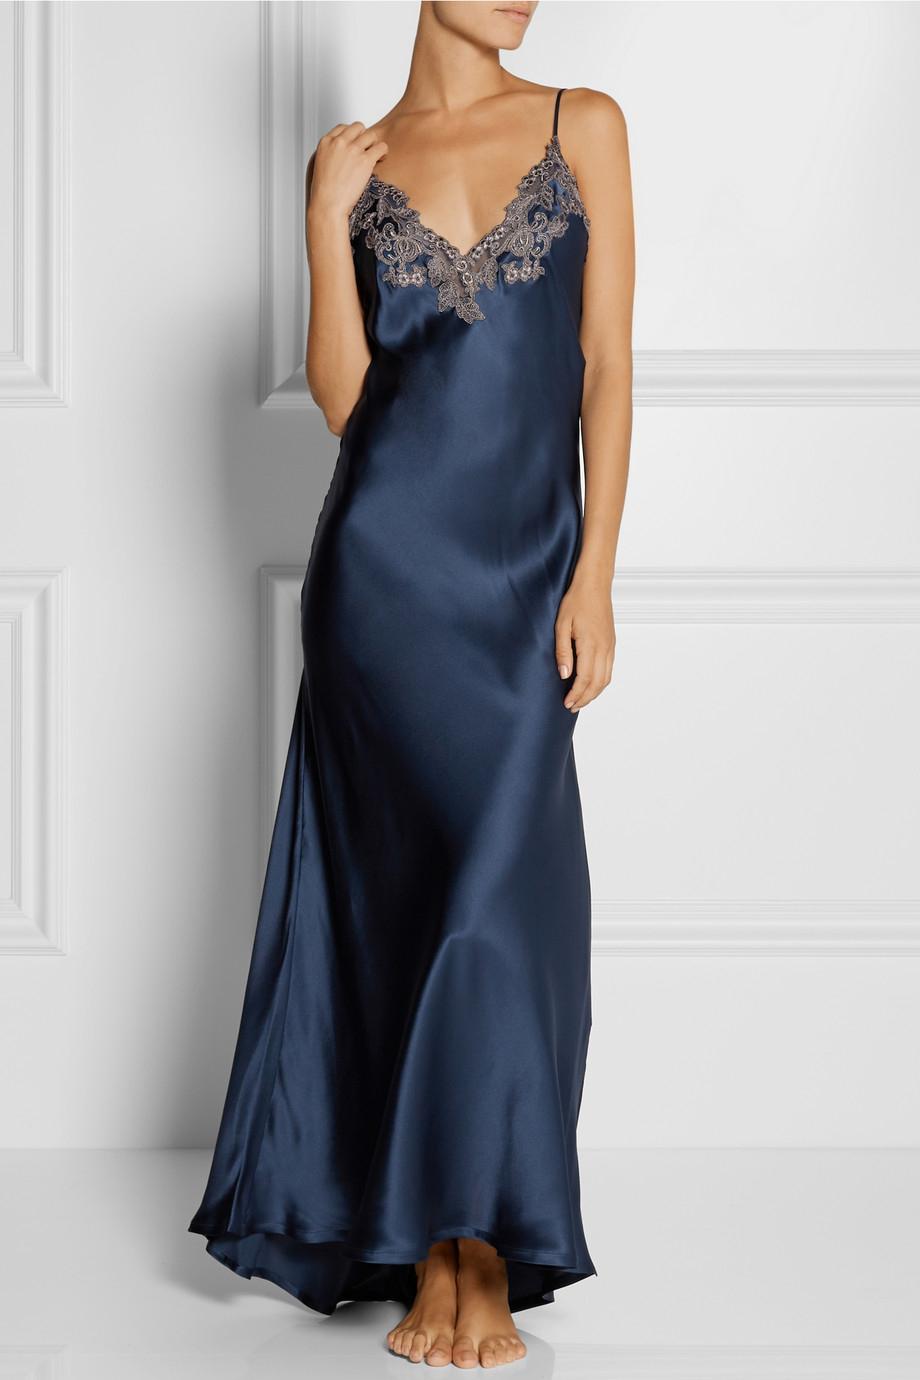 La perla Maison LaceTrimmed SilkBlend Satin Nightdress